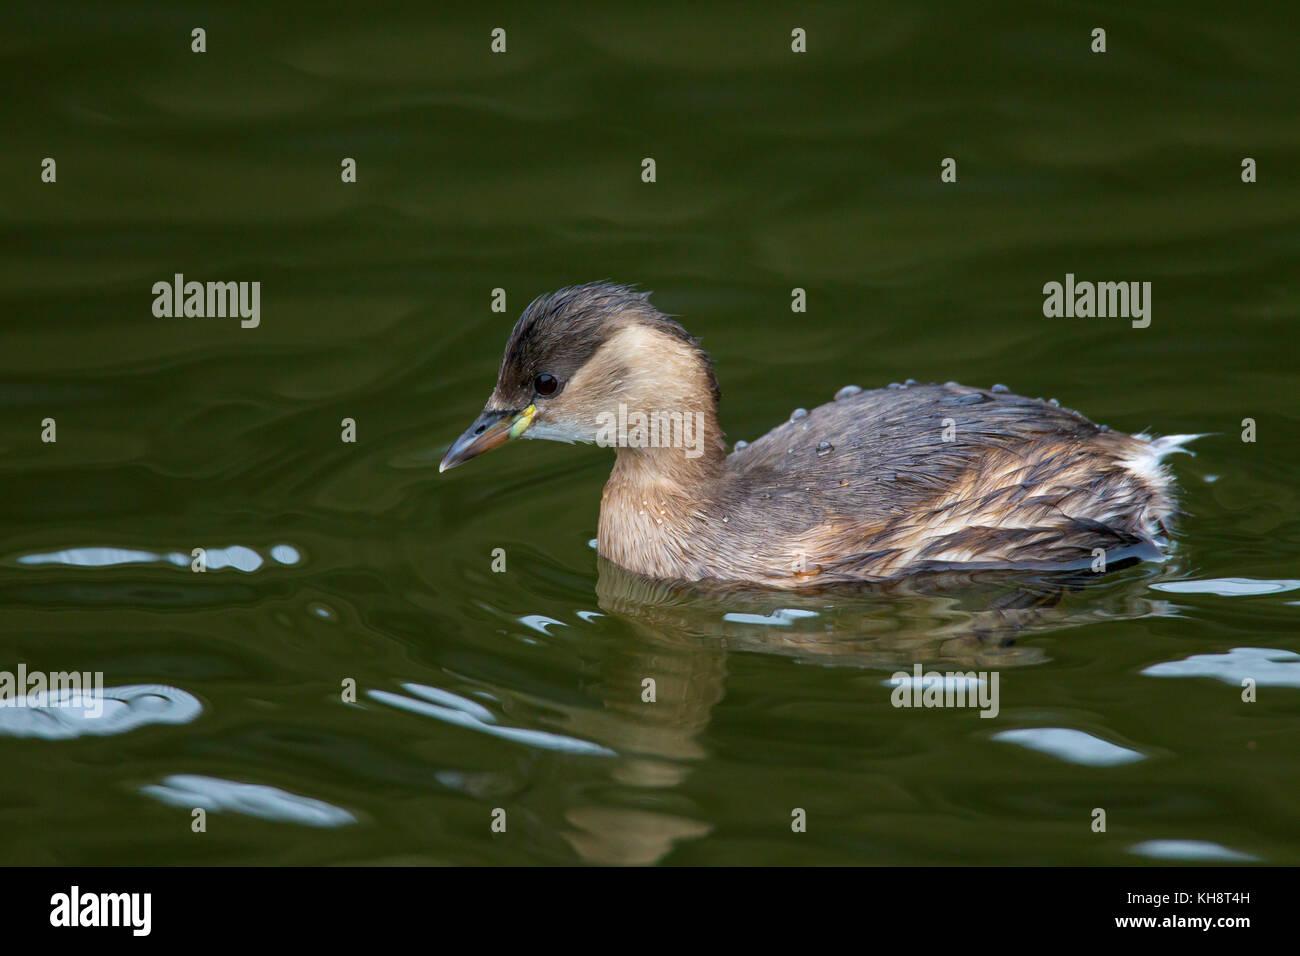 Little grebe (Tachybaptus ruficollis / Podiceps ruficollis) swimming in winter plumage - Stock Image